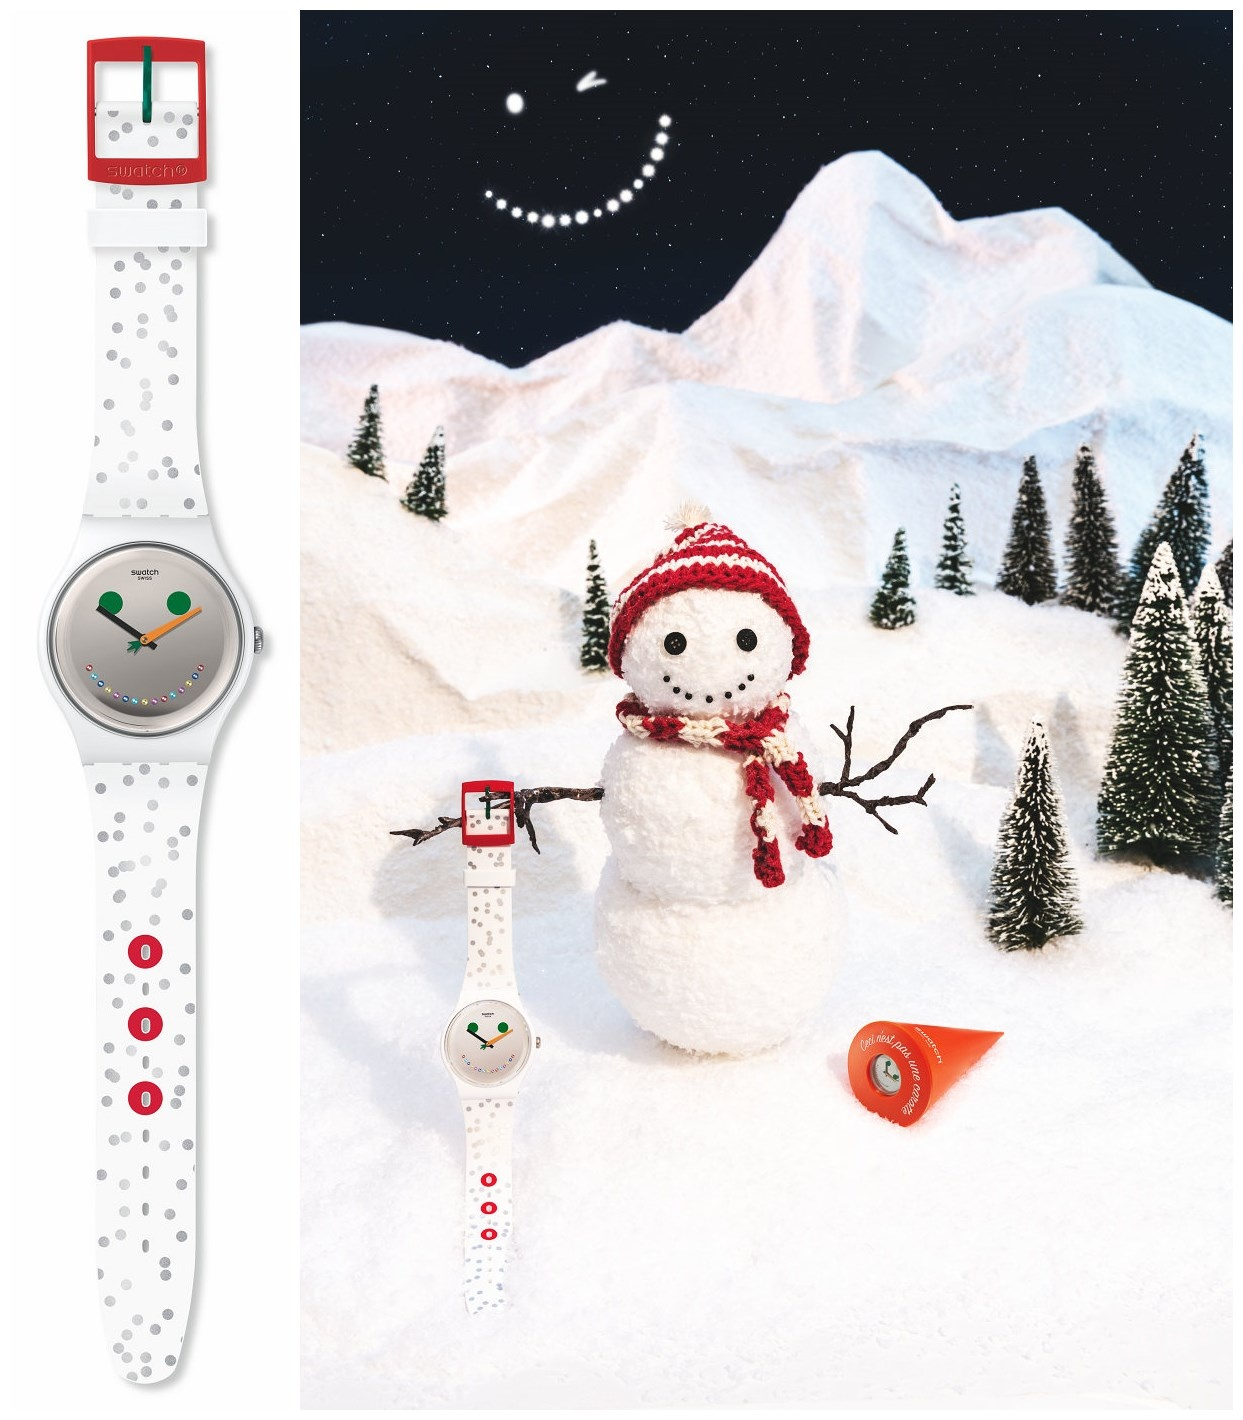 Swatch推出圣诞限量版腕表ISIDOR,和雪人一起庆祝圣诞节!